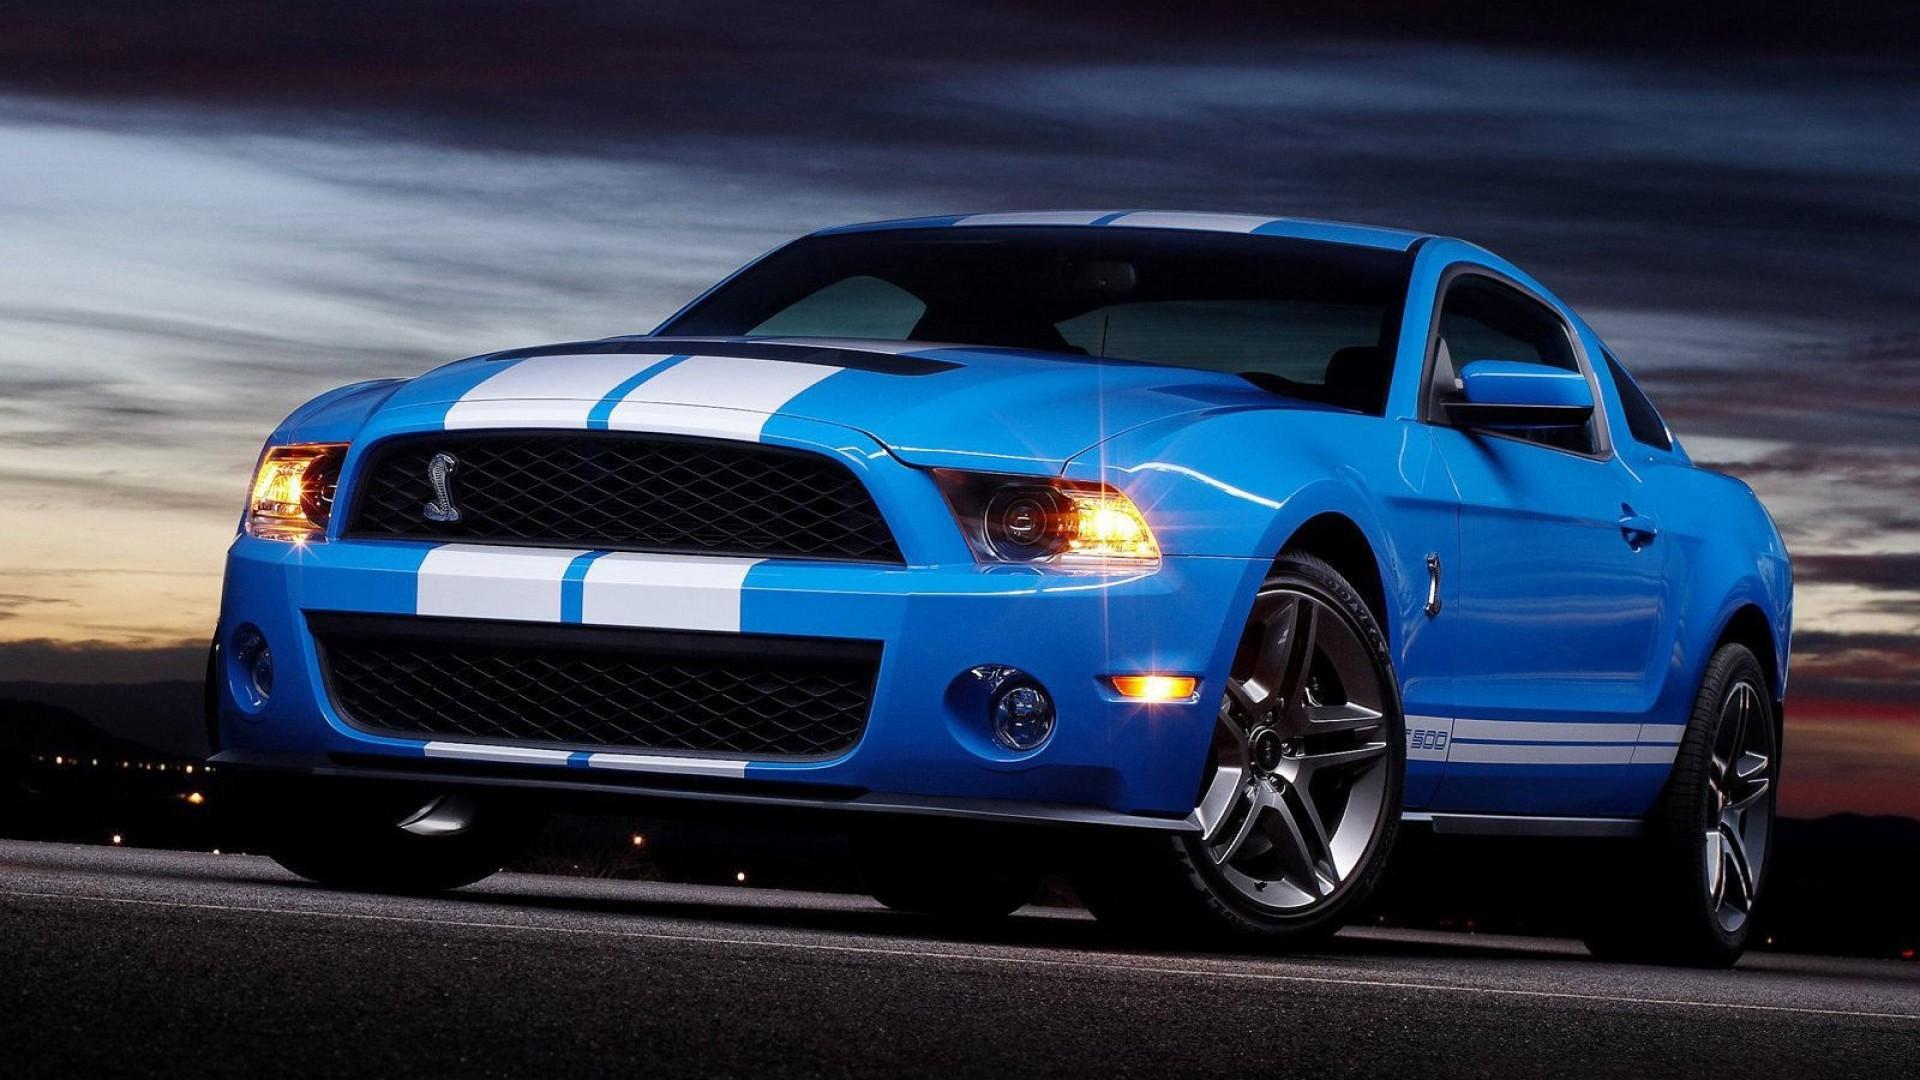 Mustang 2013 Wallpaper Hd